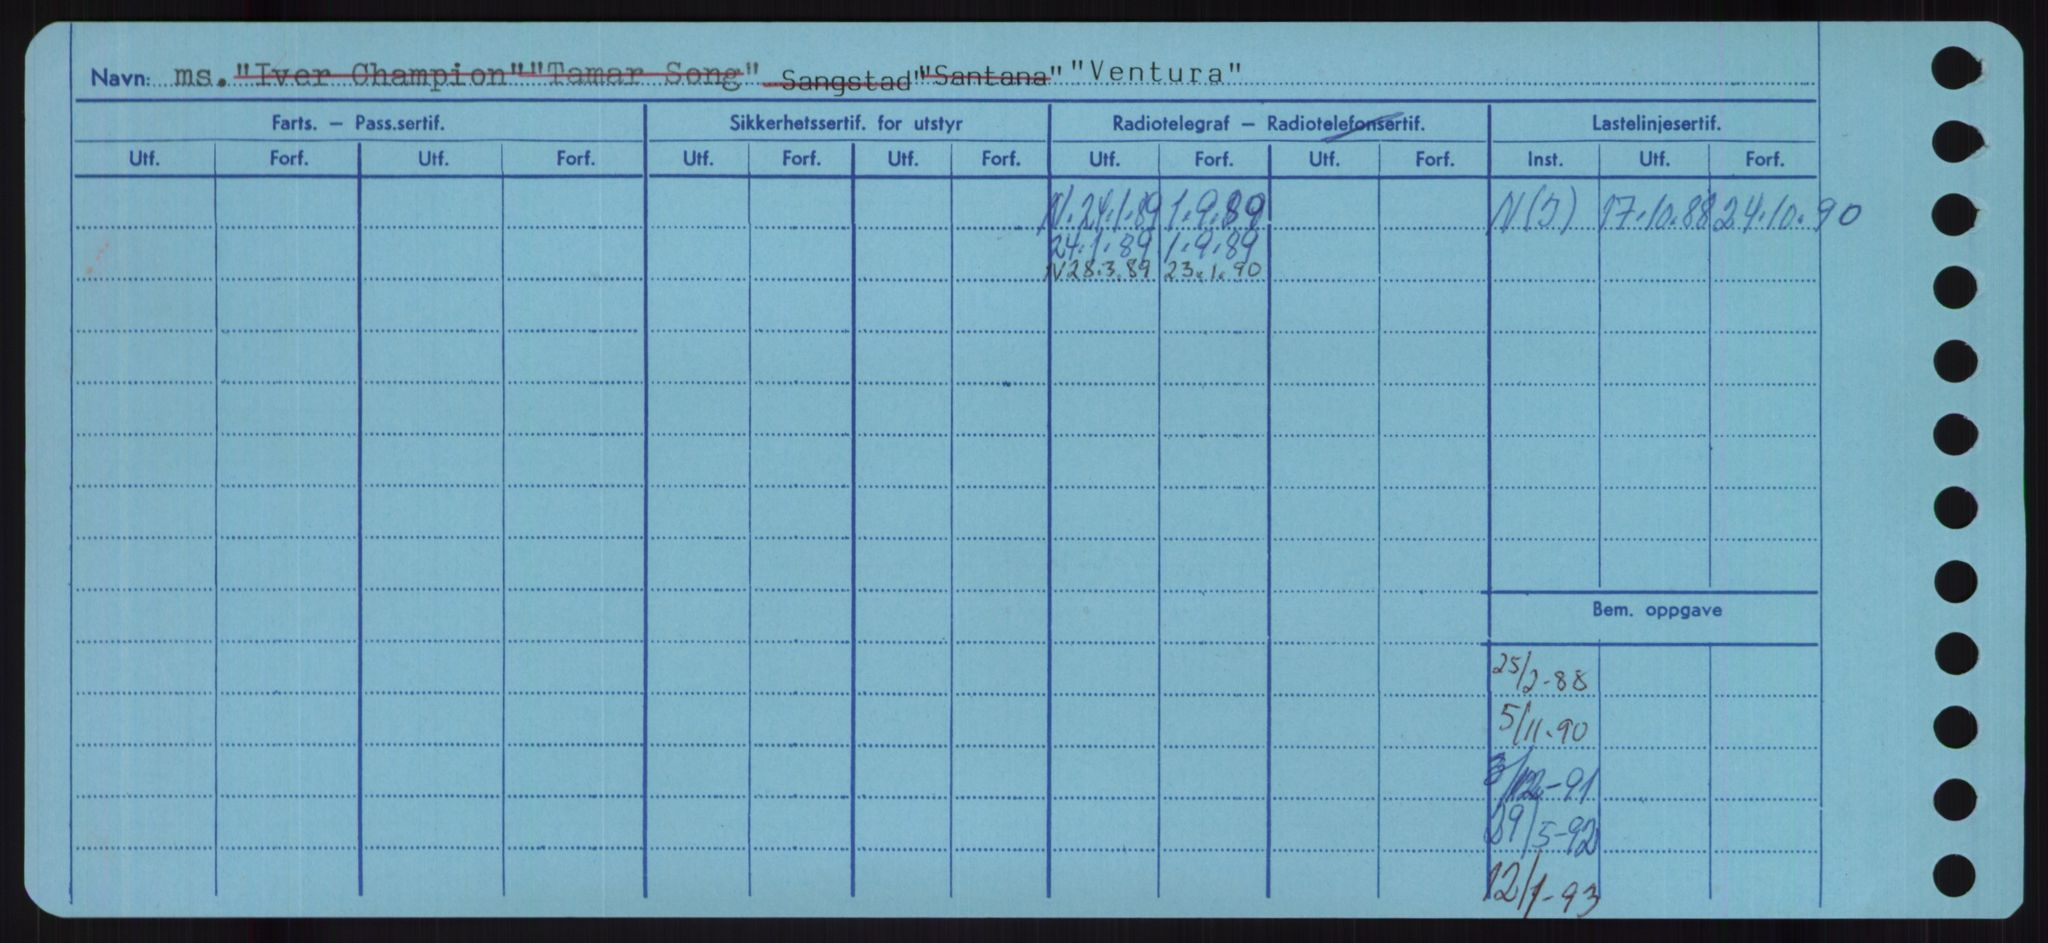 RA, Sjøfartsdirektoratet med forløpere, Skipsmålingen, H/Ha/L0006: Fartøy, Sver-Å, s. 252